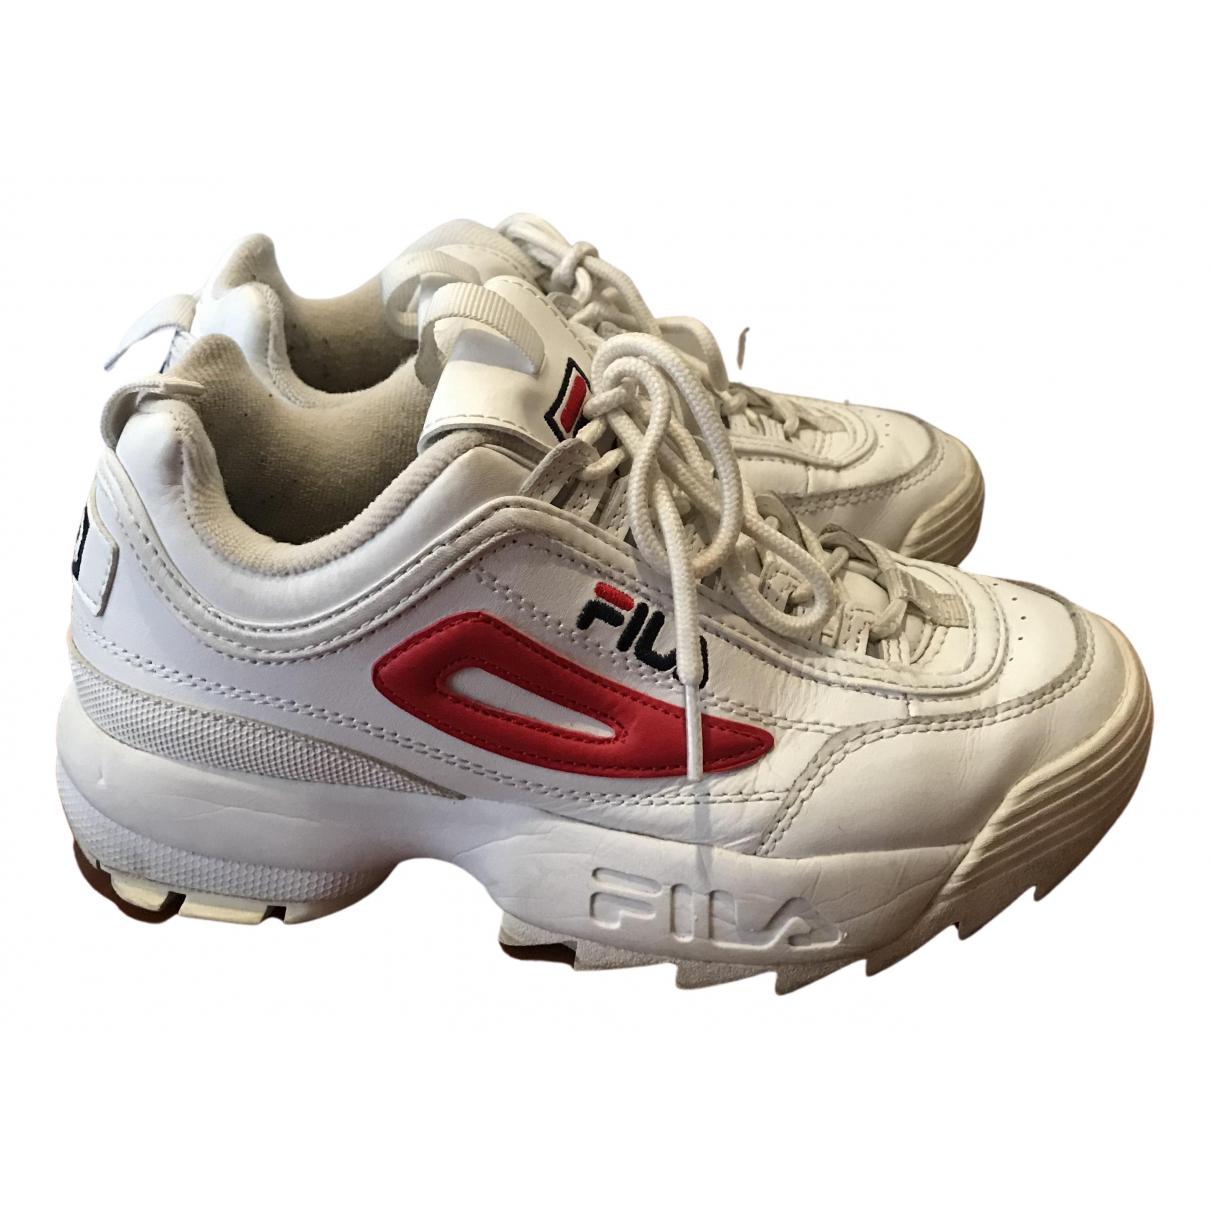 Fila \N Sneakers in  Weiss Kautschuk